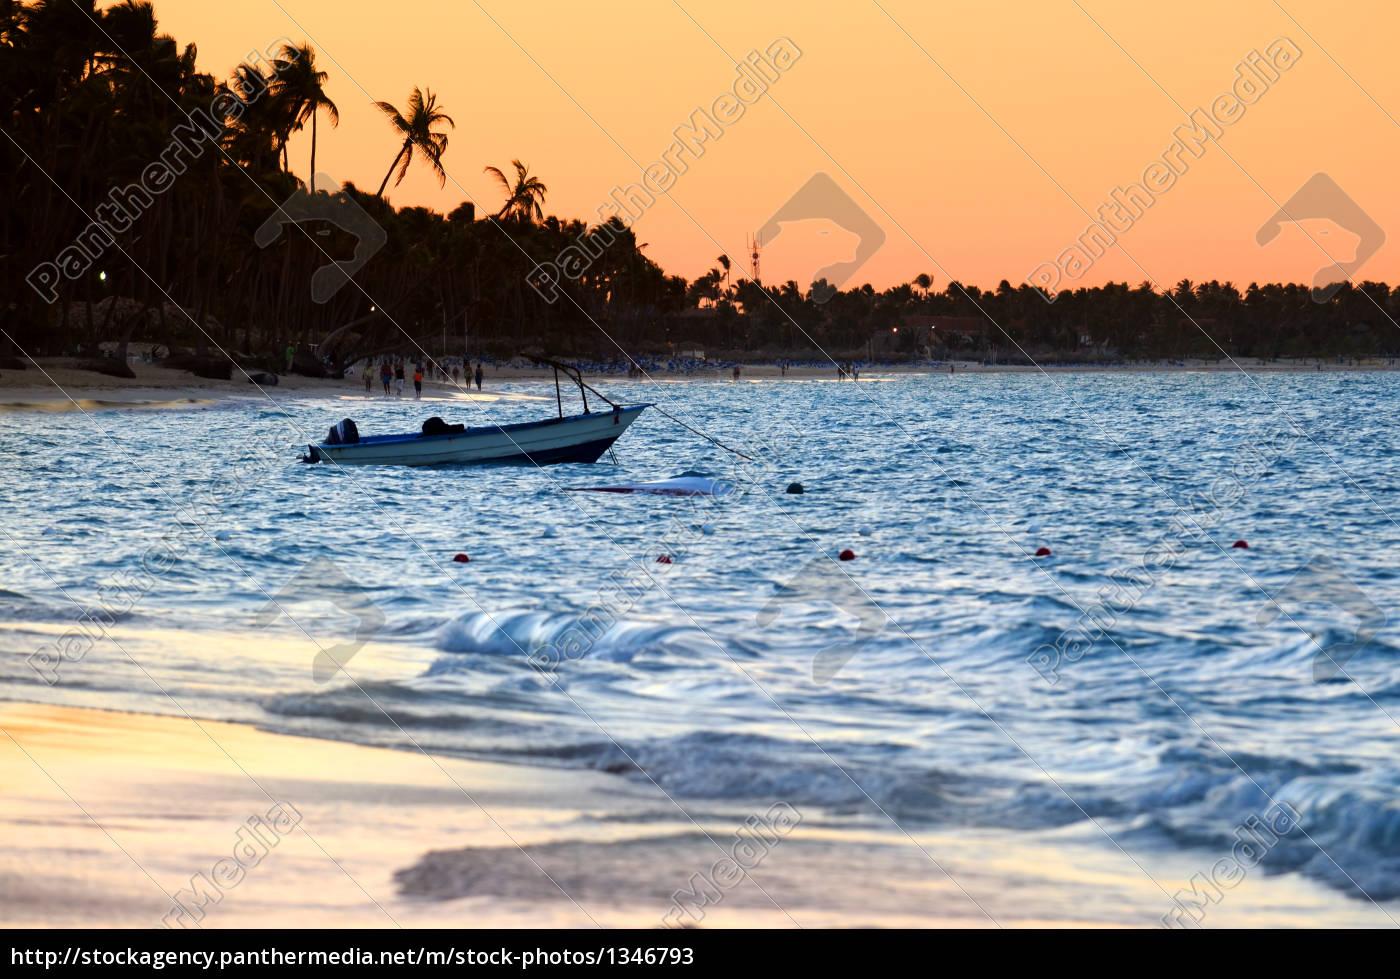 tropical, beach, at, sunset - 1346793